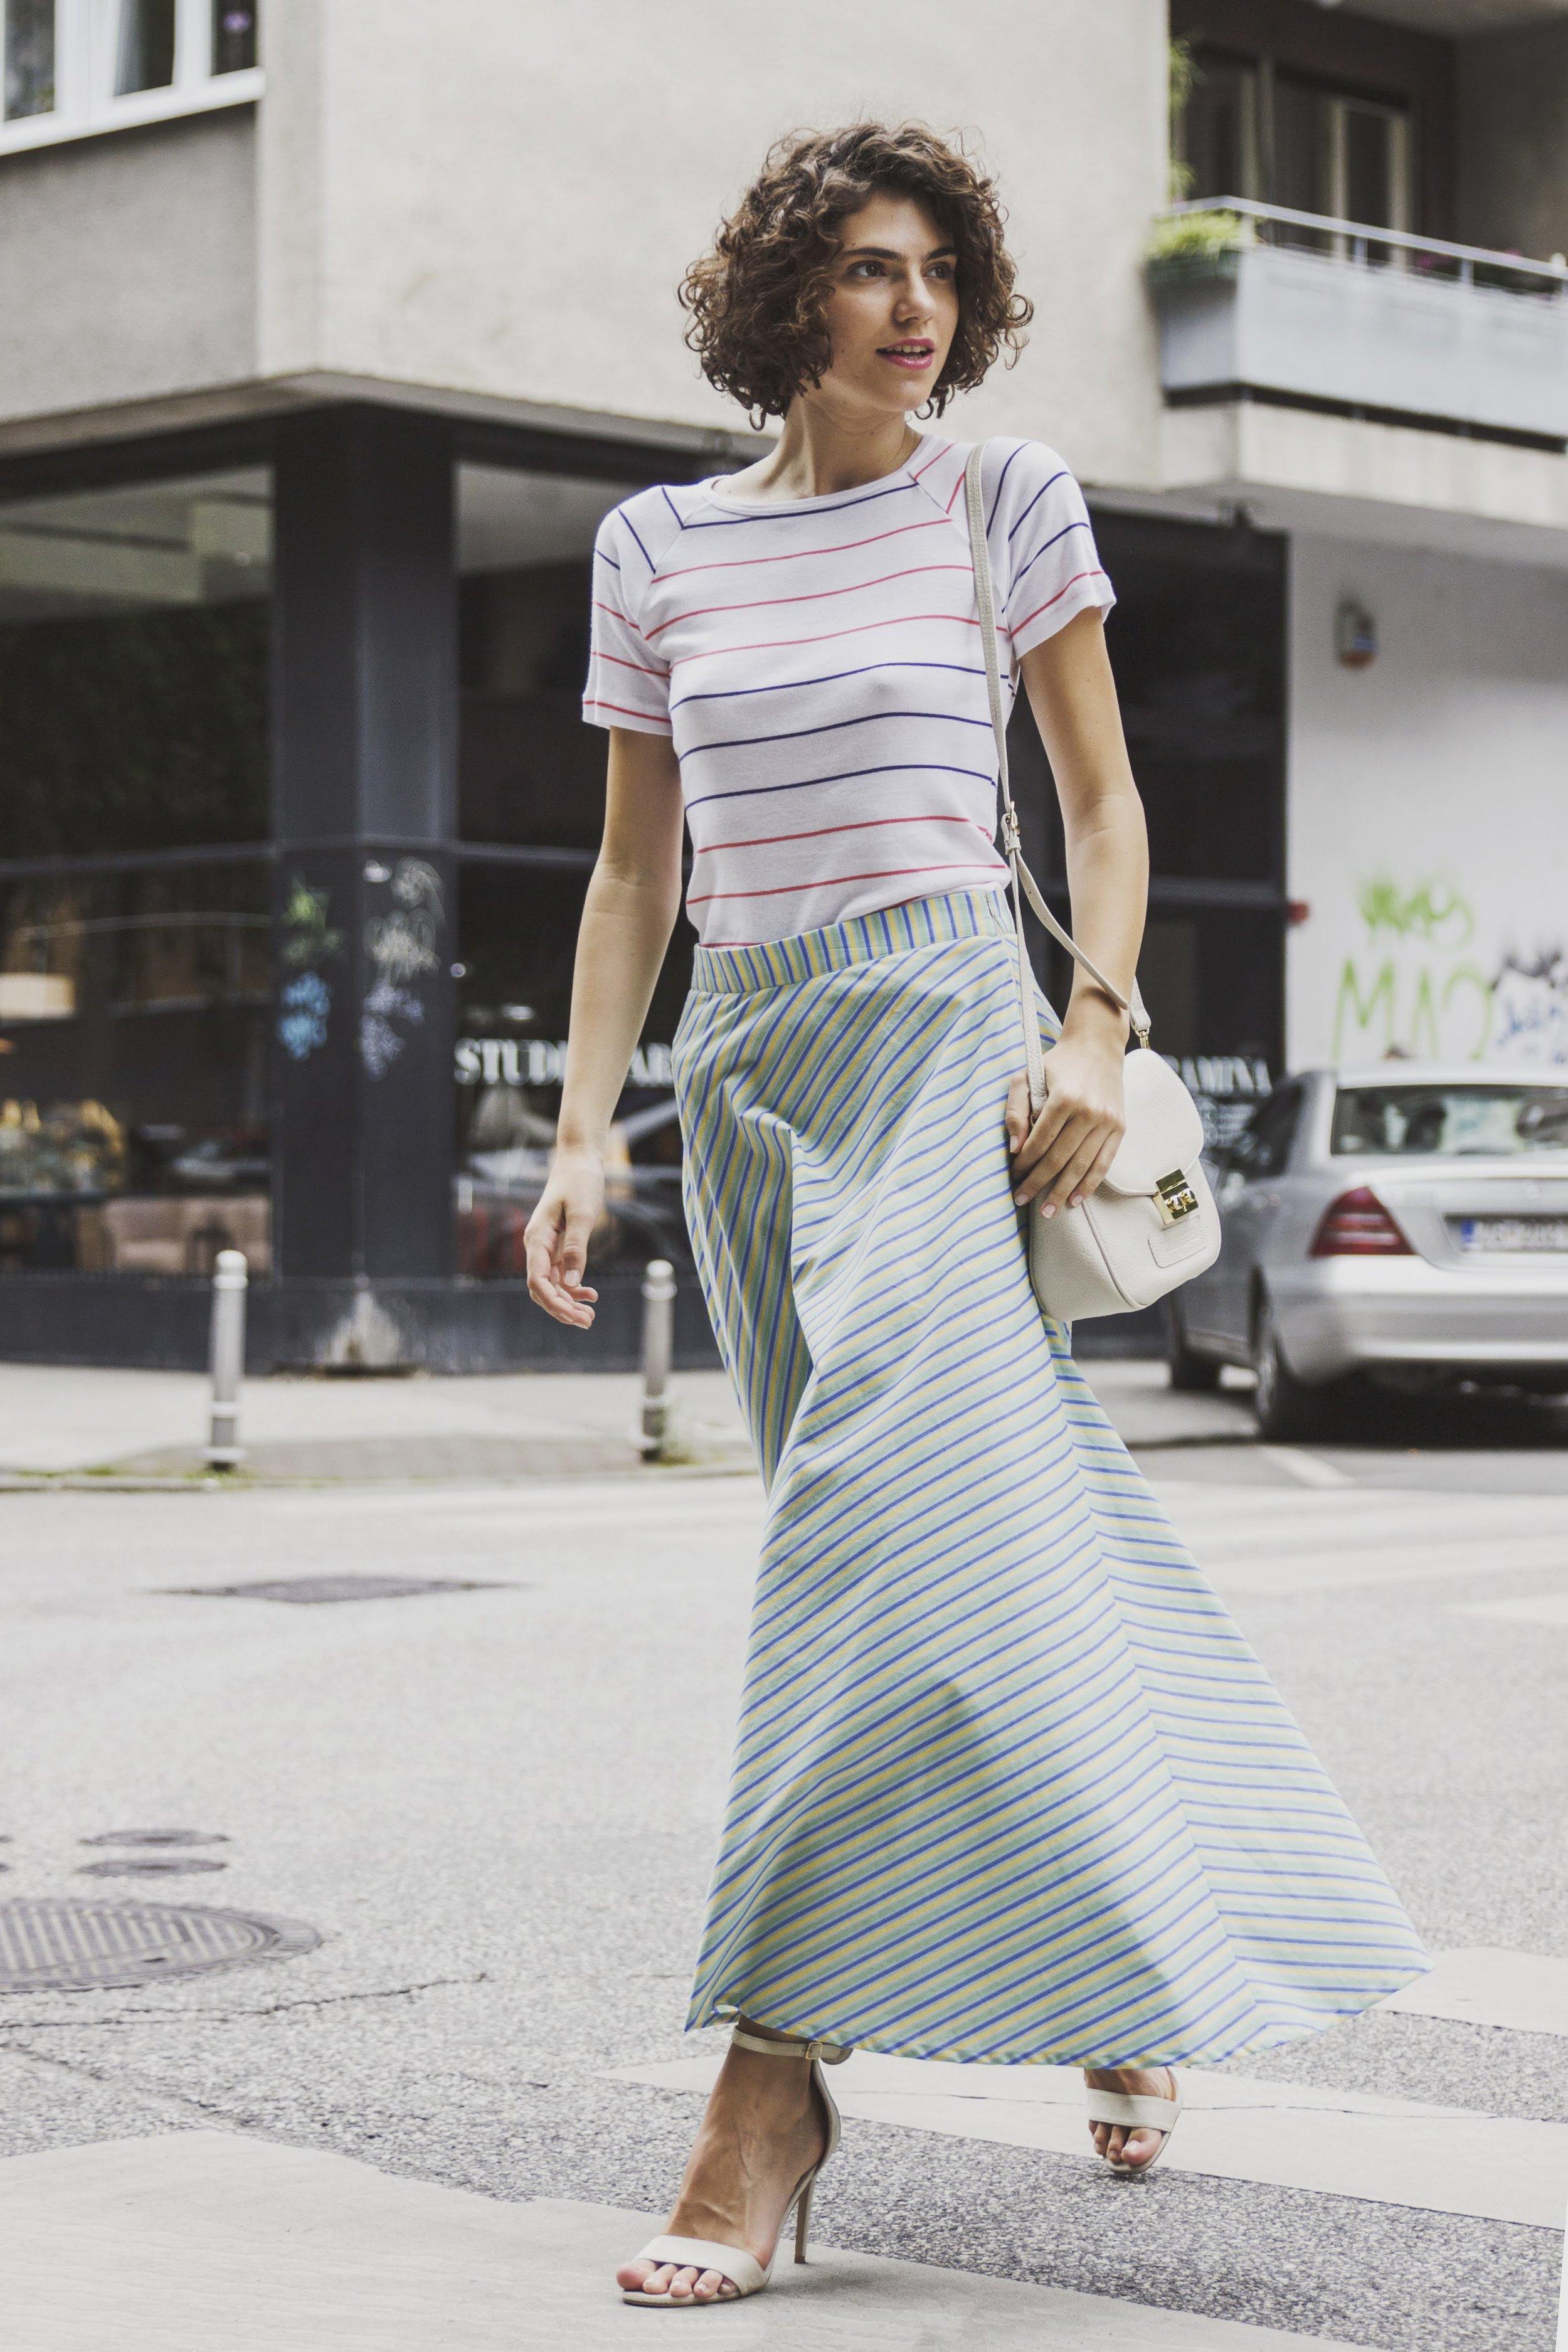 luka-lajic-fashion-photography-robert-sever-dizajner-croatian (5).jpg